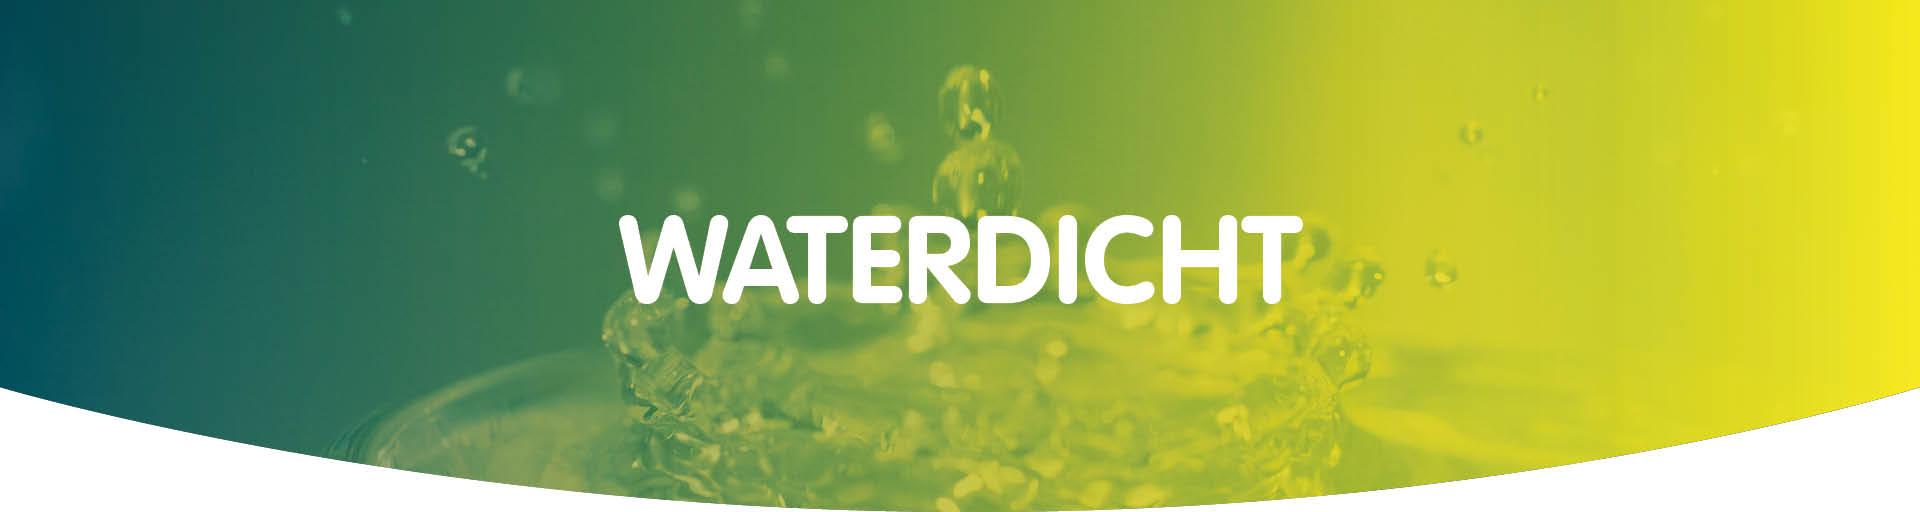 Waterdichte Werklaarzen